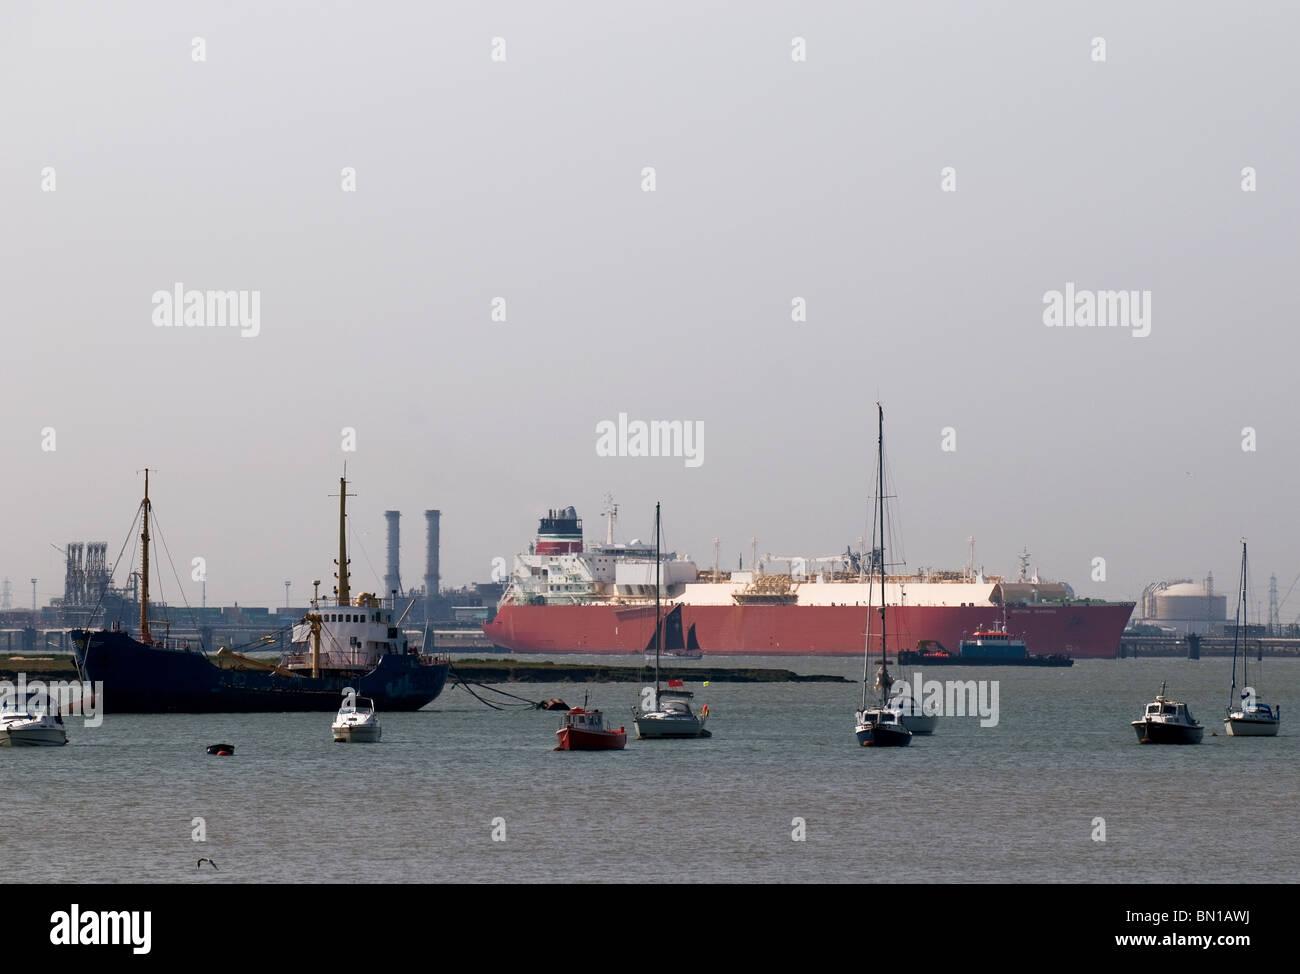 Le navi ormeggiate in Sheerness Docks sull'Isle of Sheppey in Kent. Immagini Stock